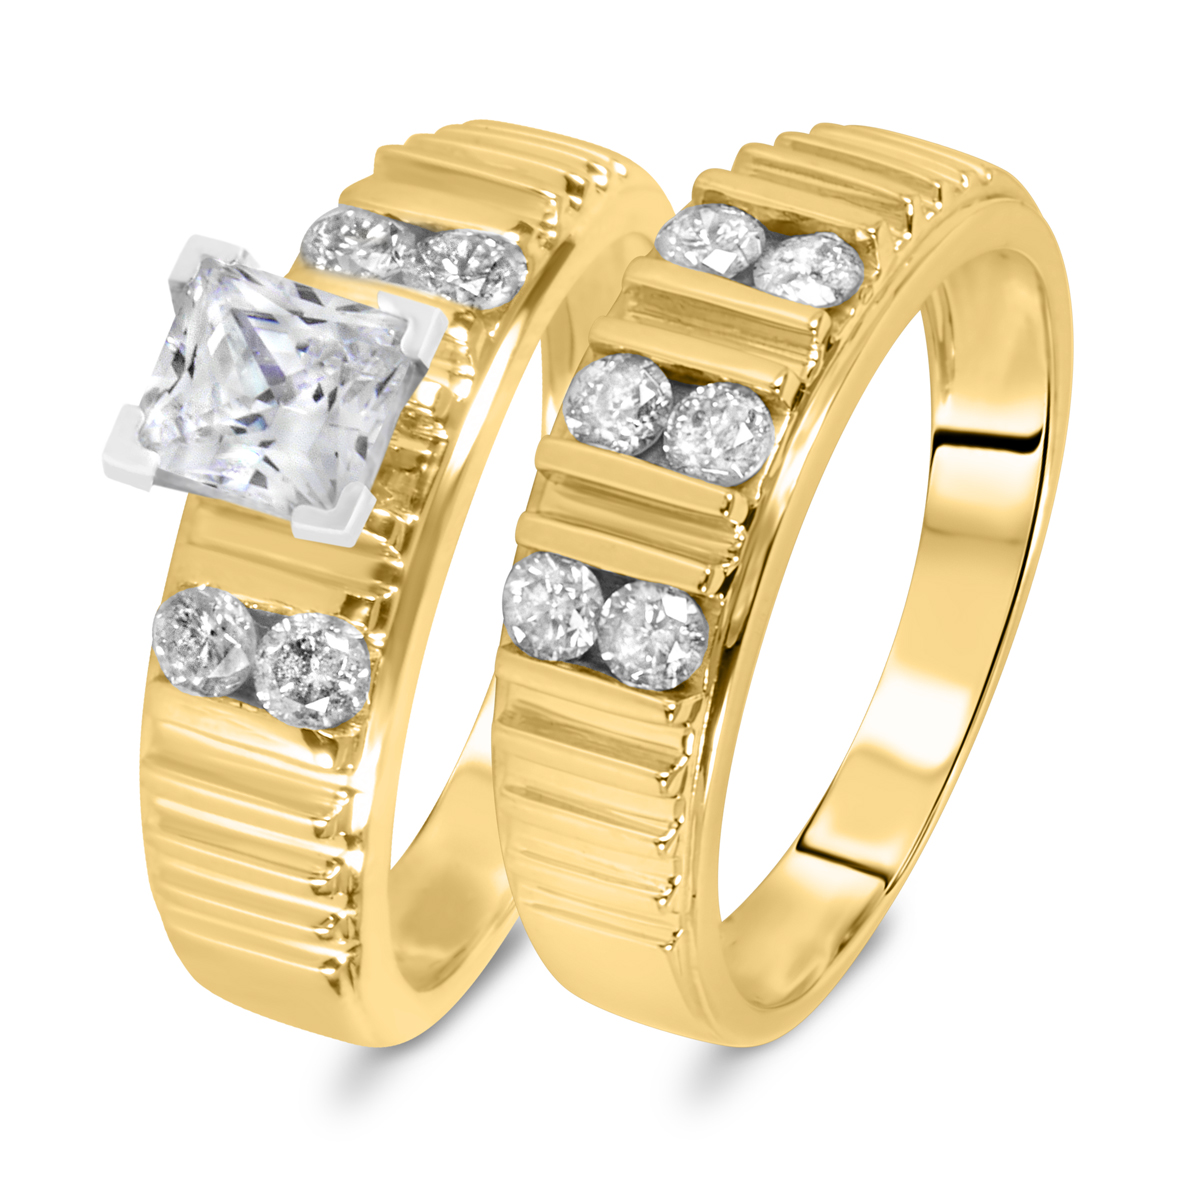 1 5/8 CT. T.W. Diamond Women's Bridal Wedding Ring Set 14K Yellow Gold